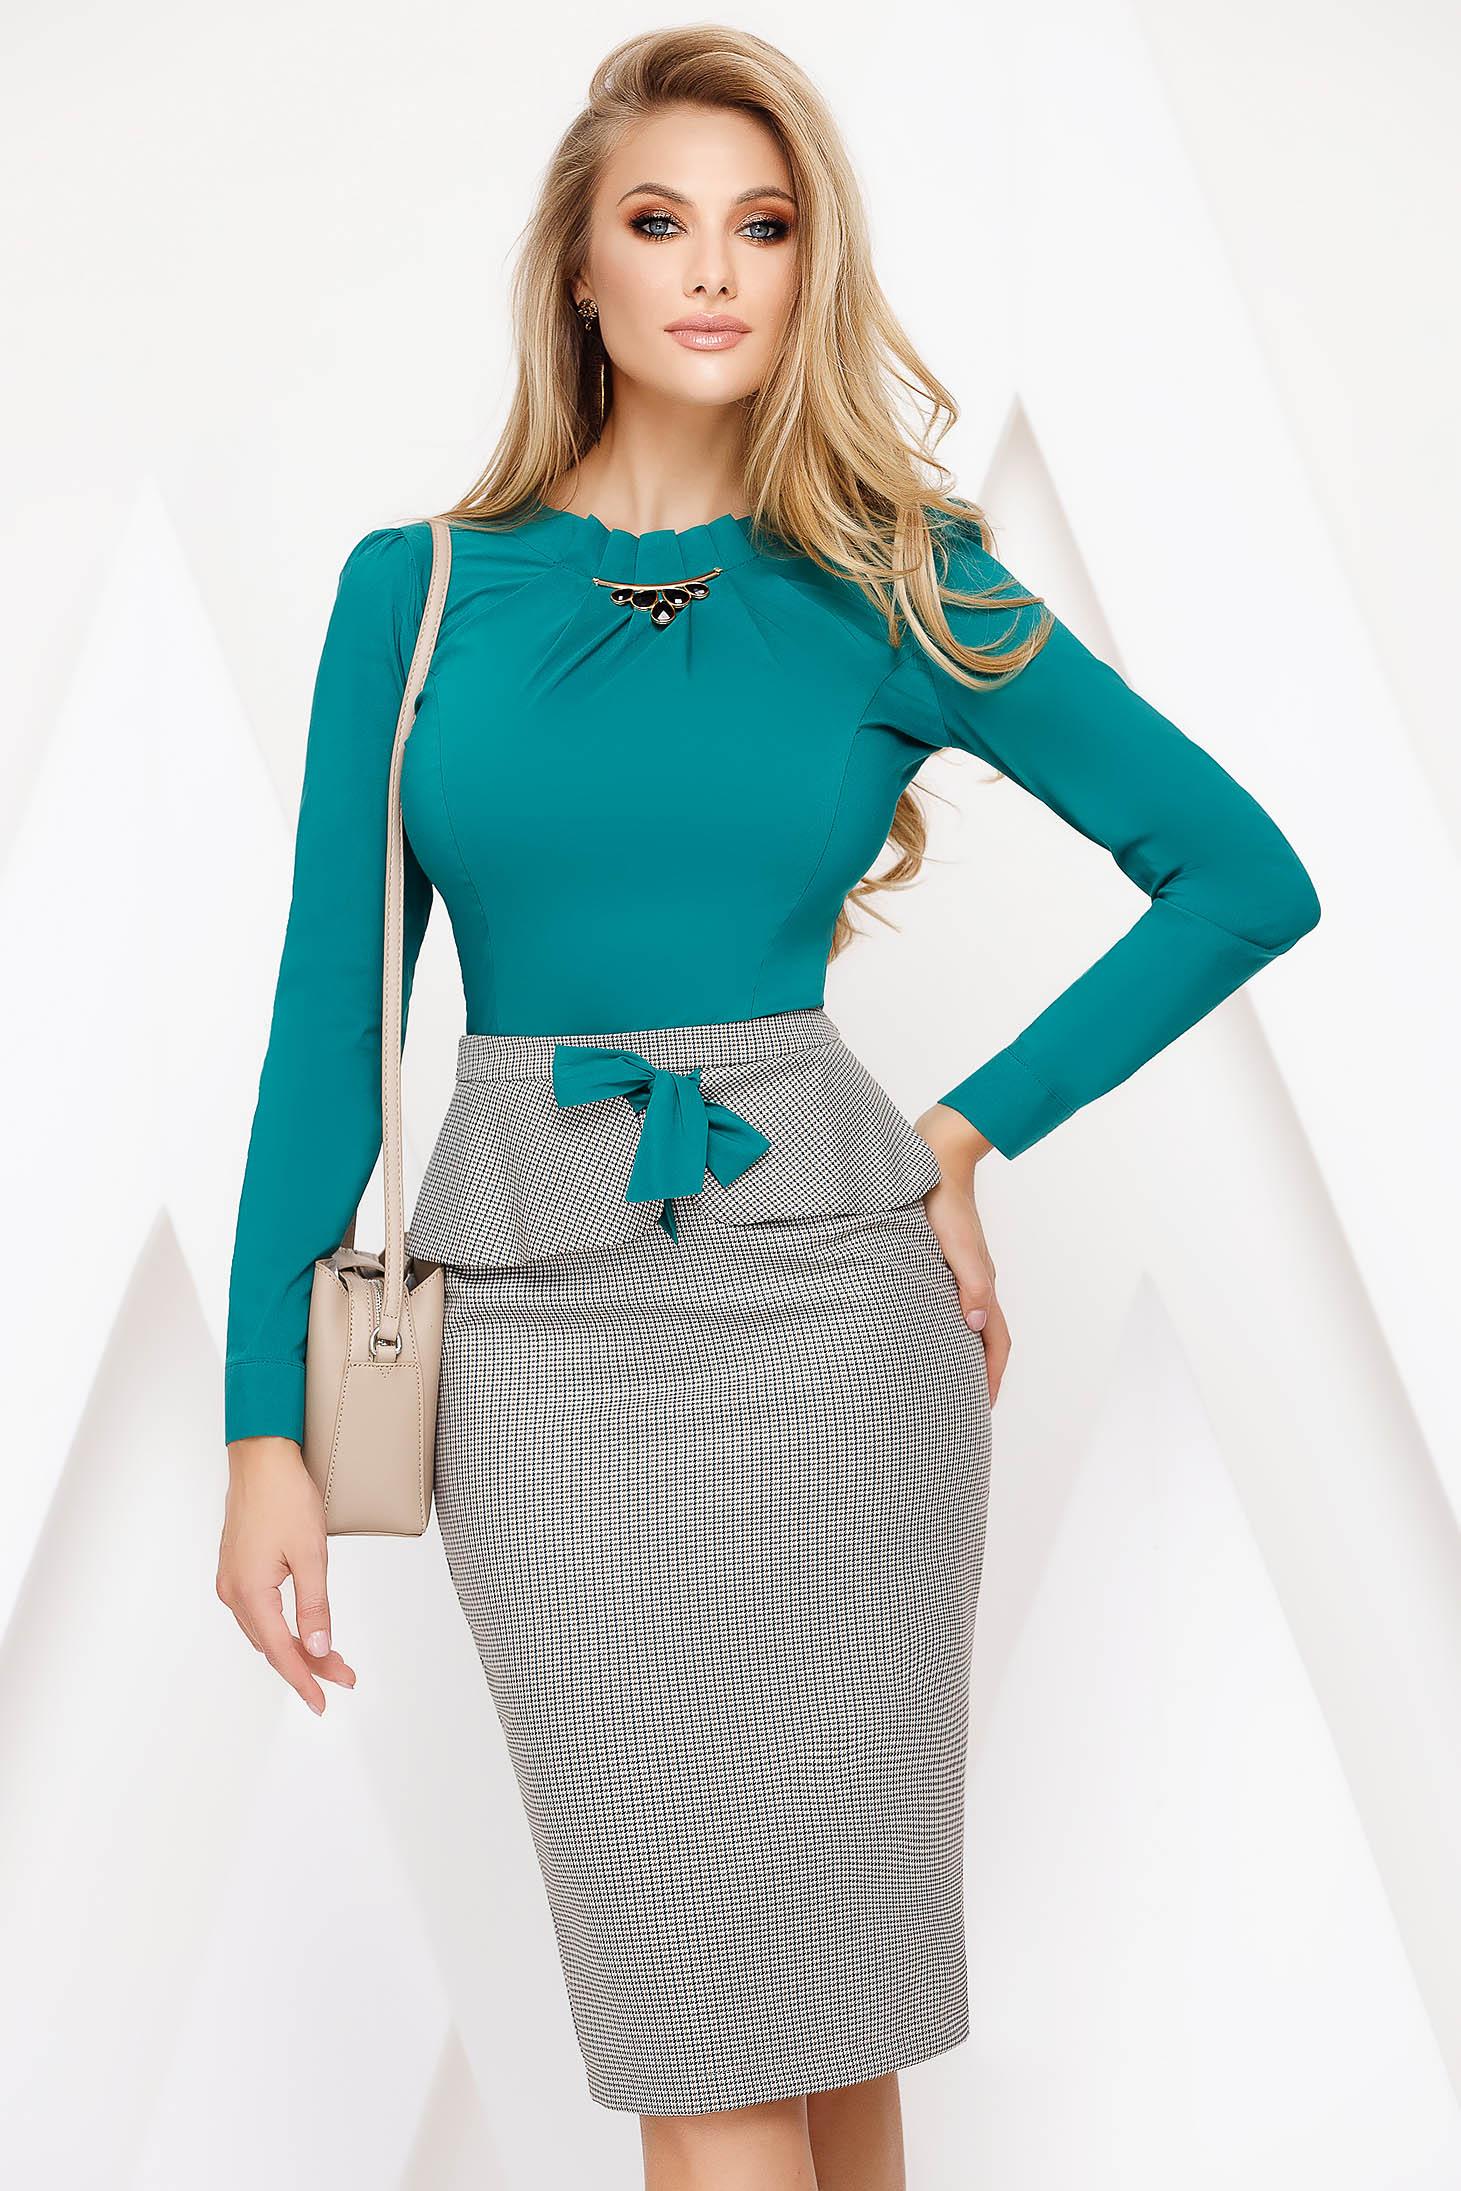 Skirt green office midi pencil cloth thin fabric